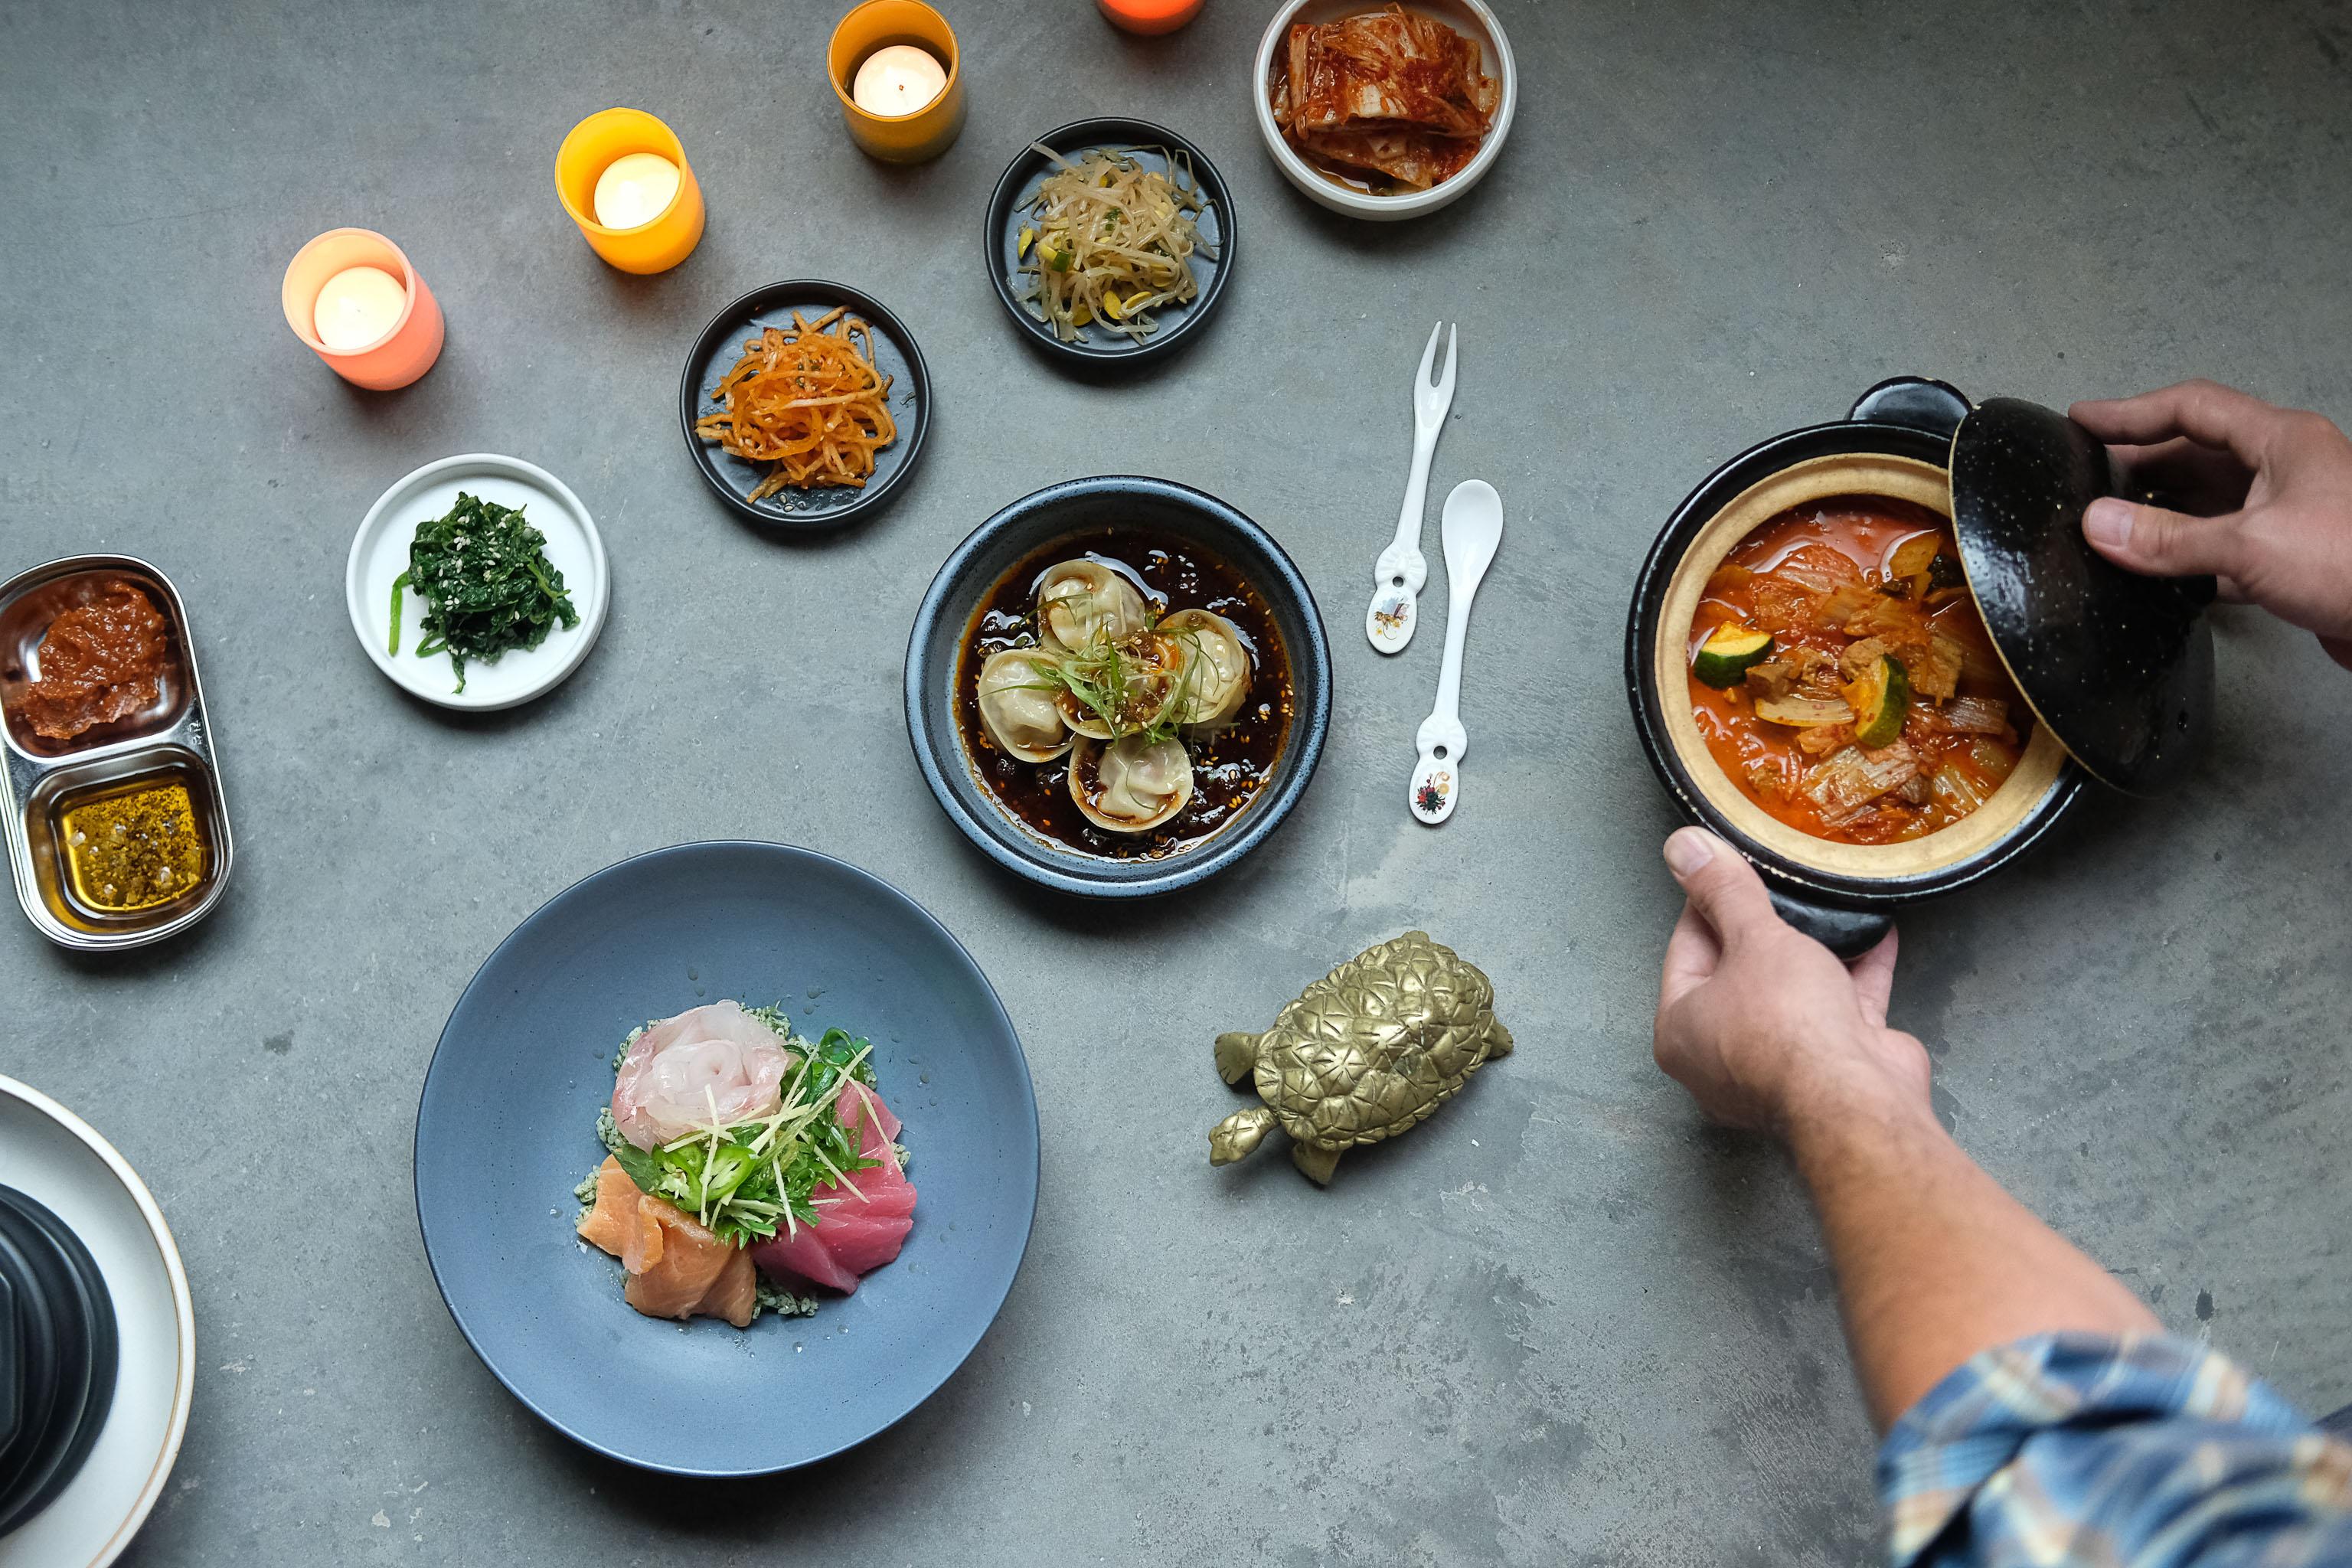 Oseyo's banchan, kimchi jigae, hwe dup bap, and mandu